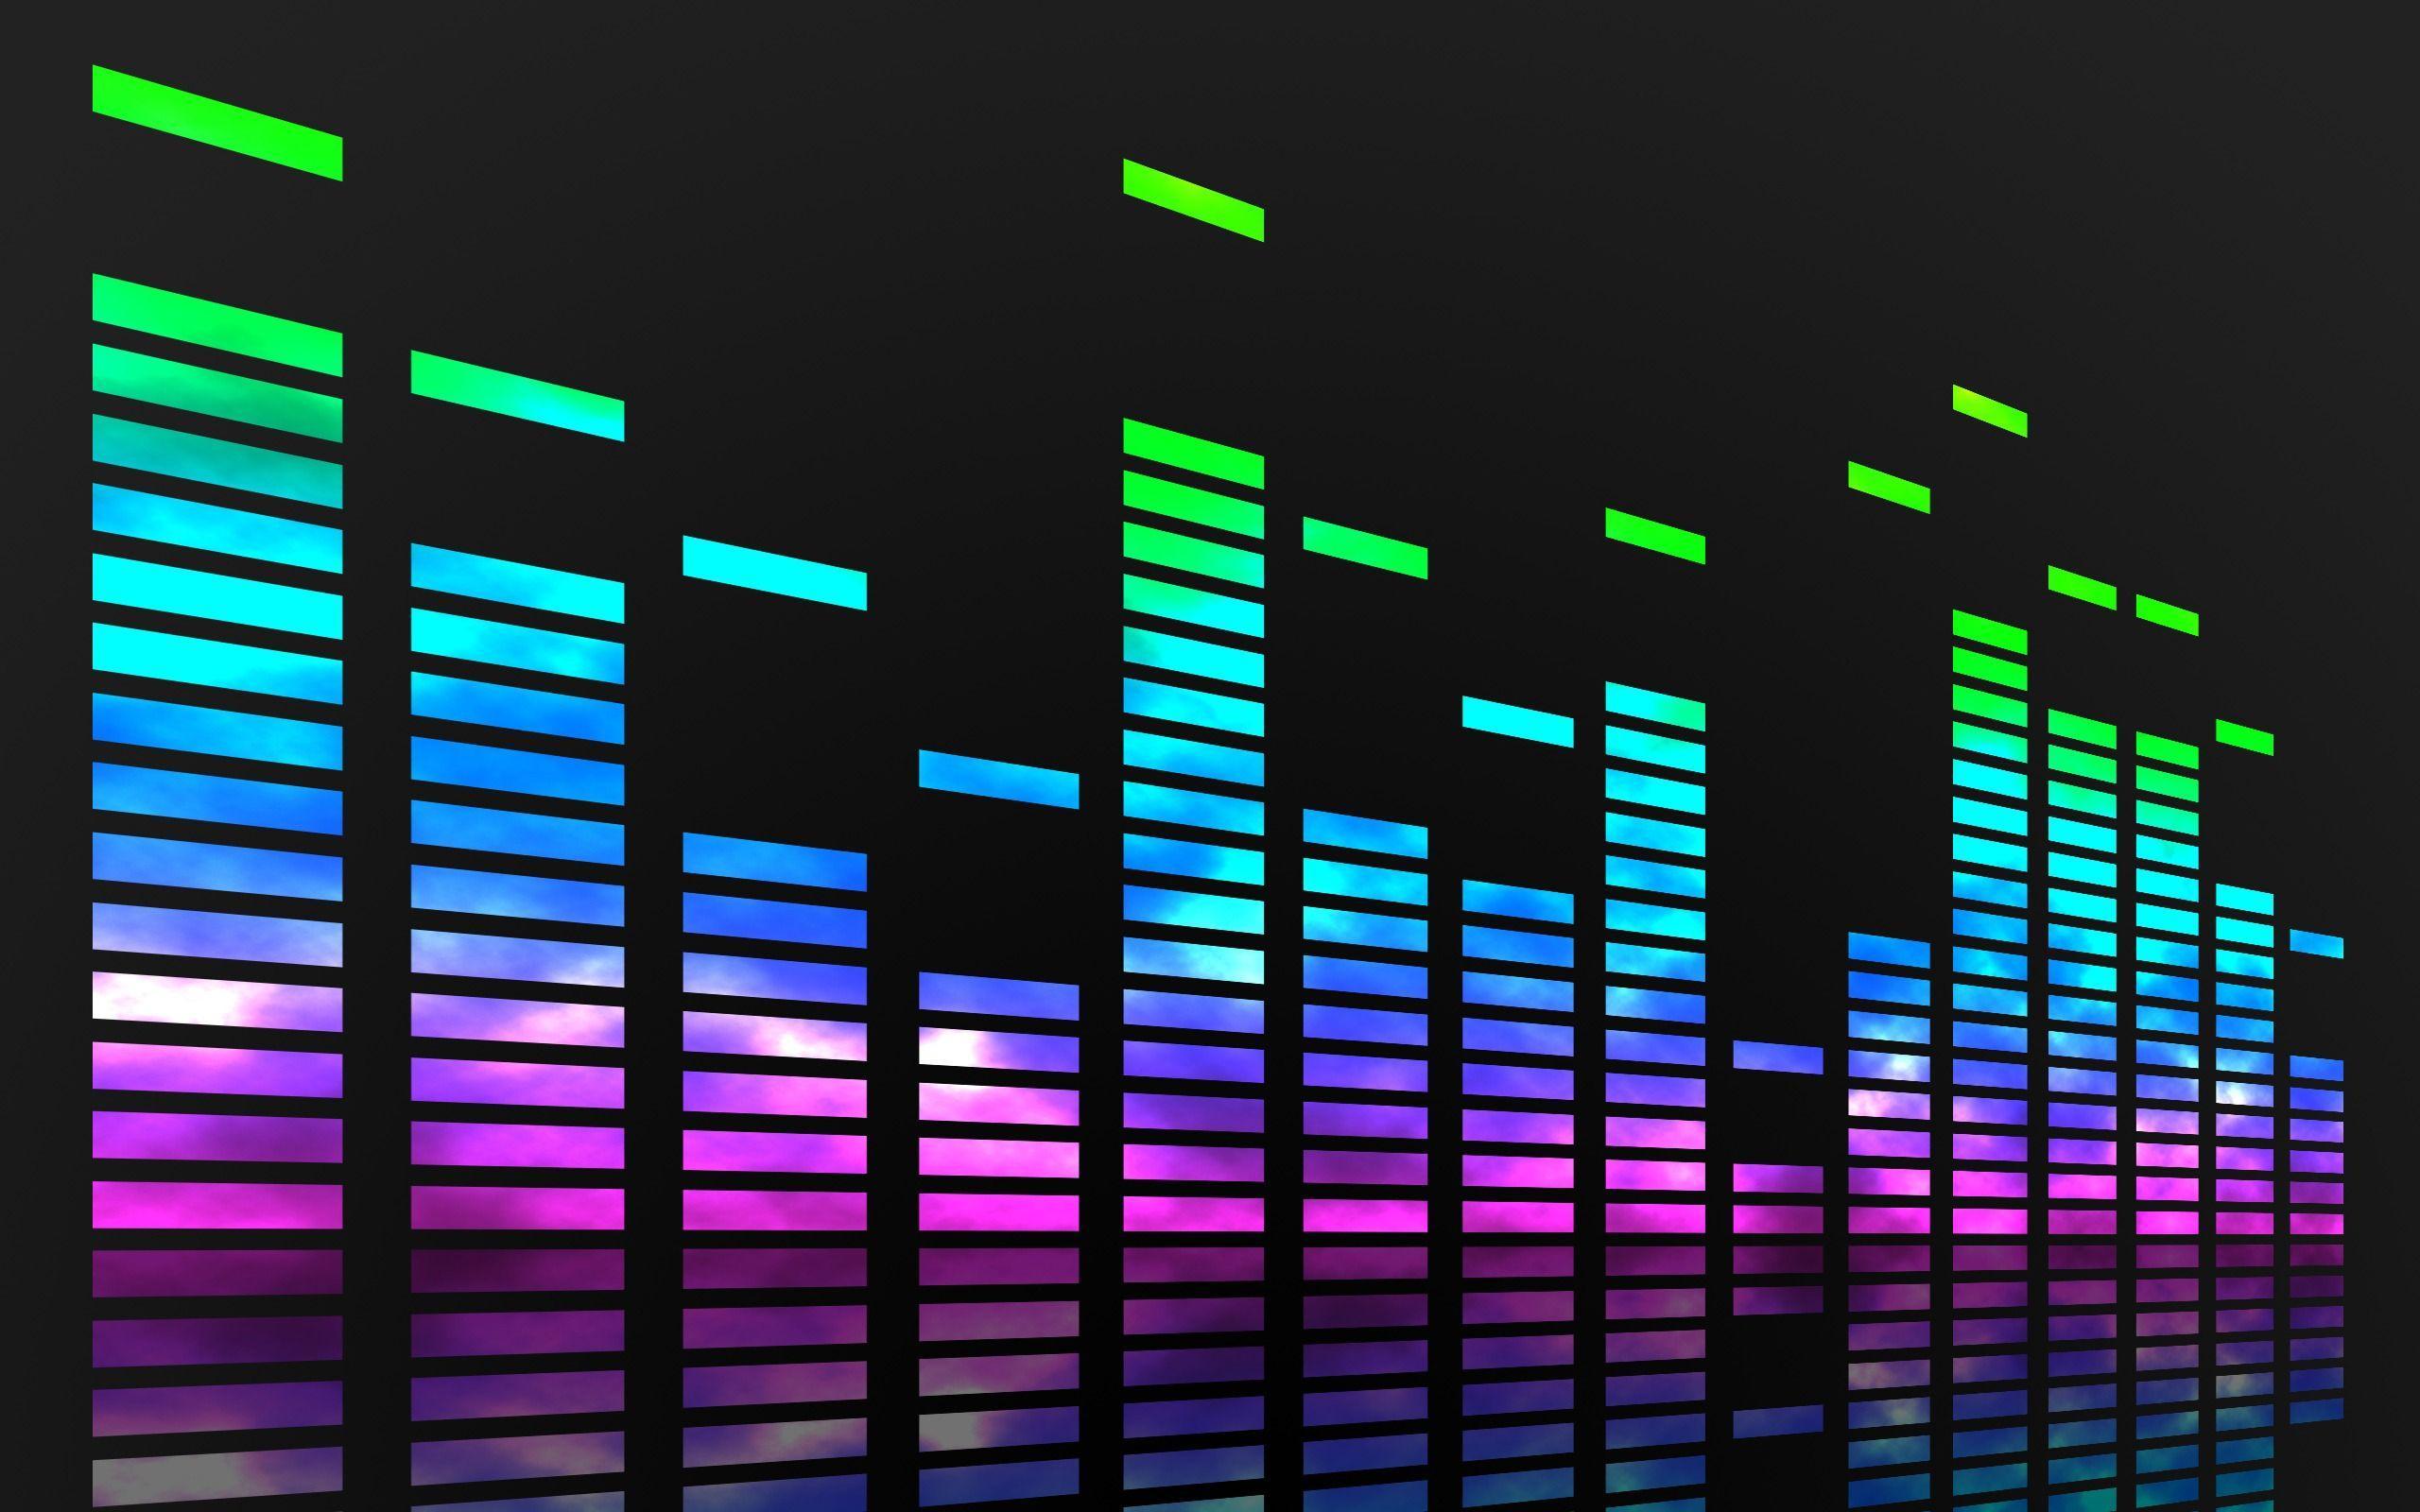 cool music wallpaper 37 - photo #4